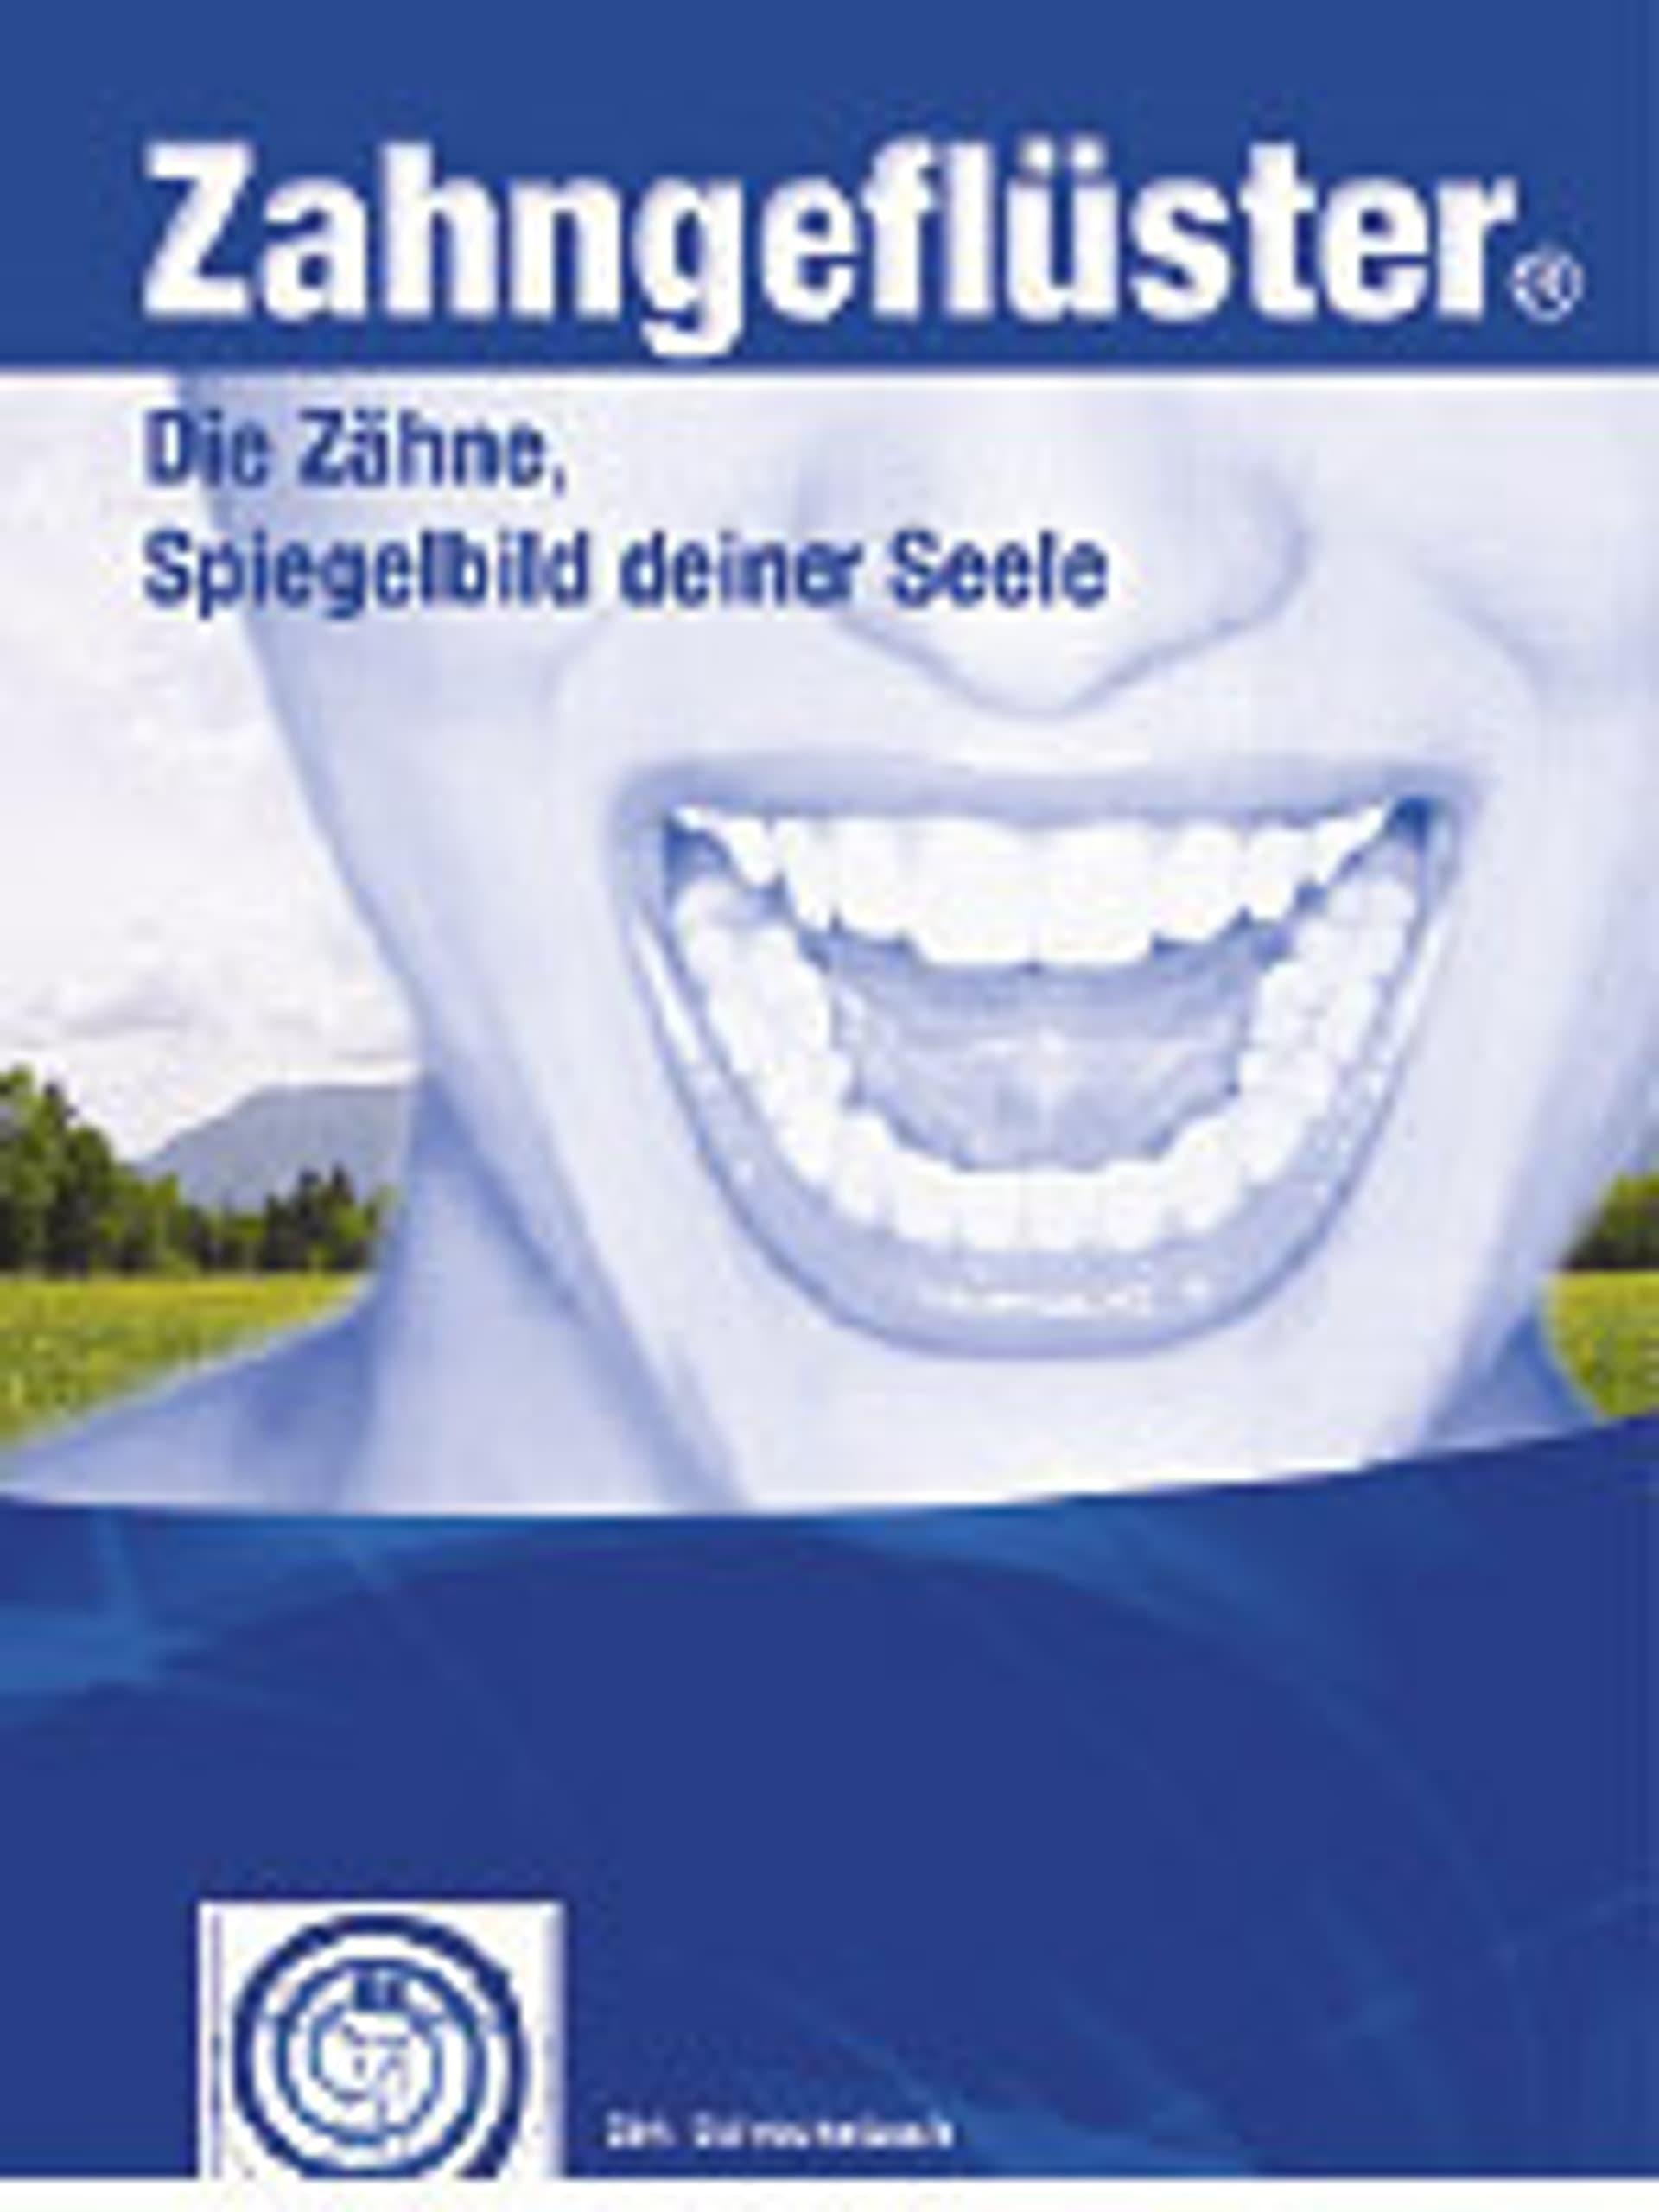 Zahngefluester